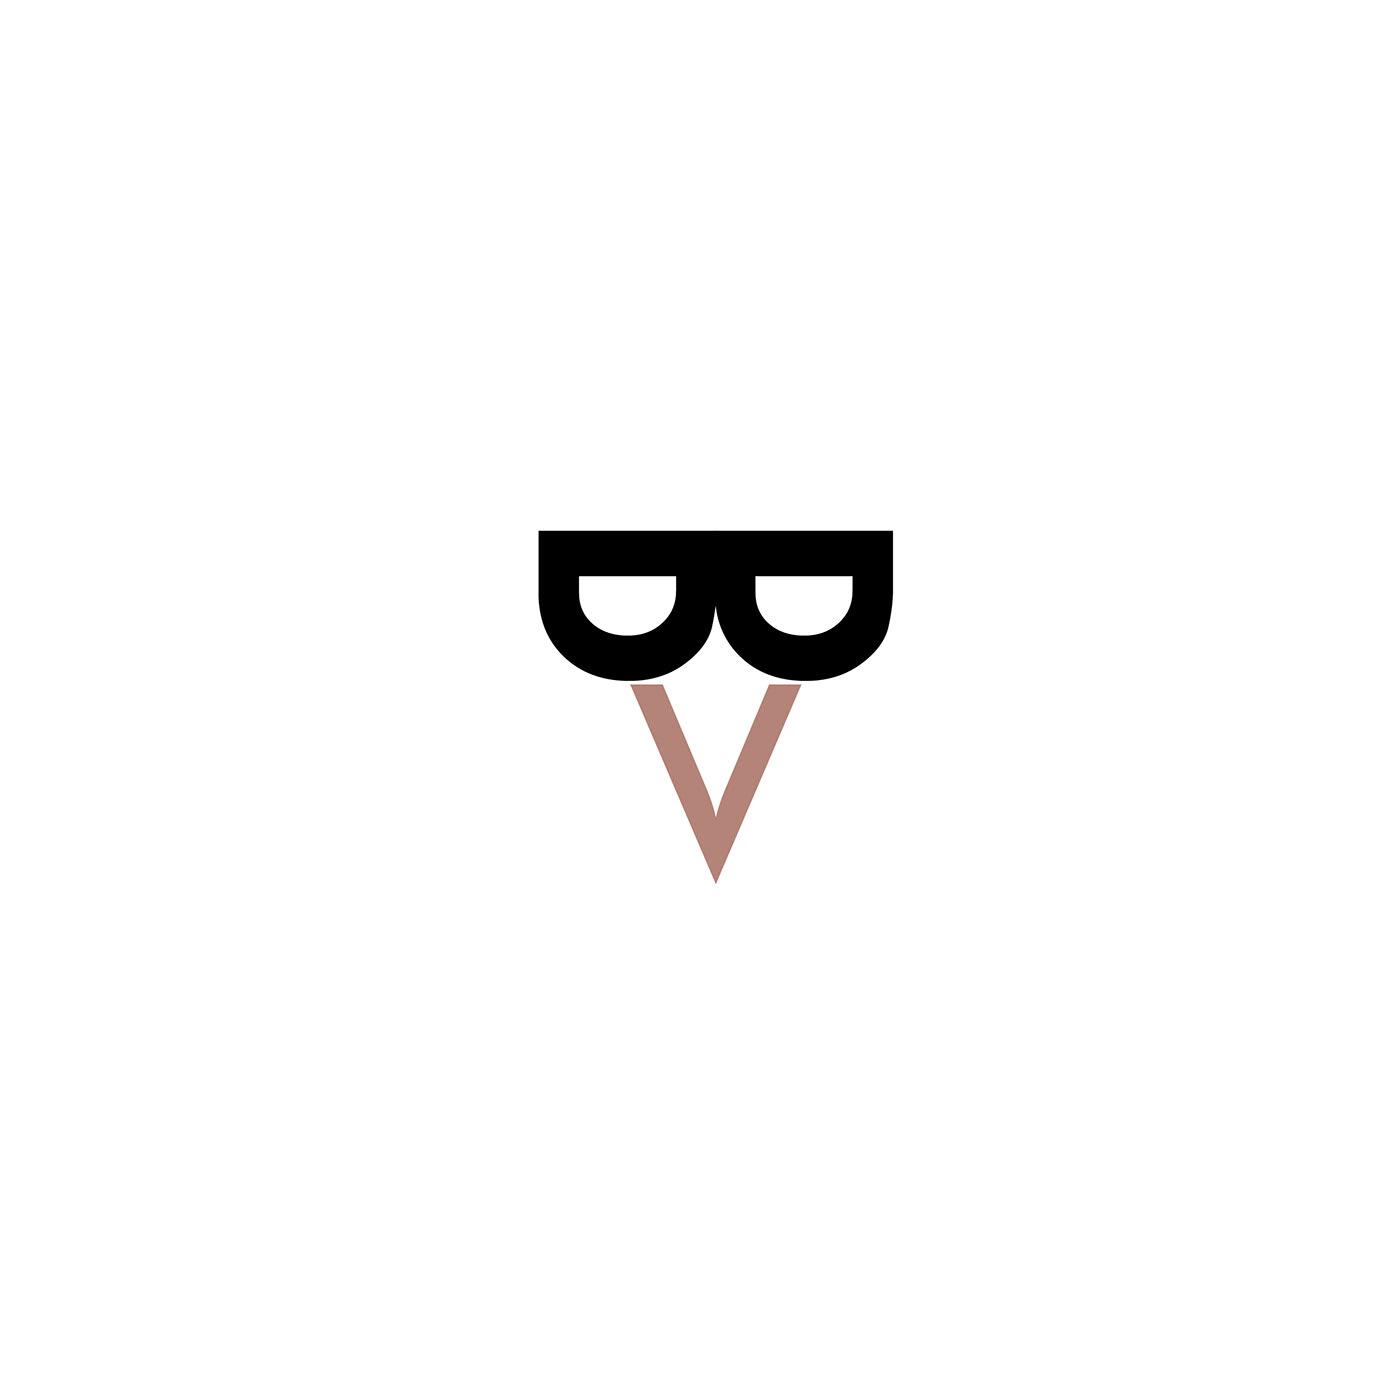 logo typography   brand identity graphic ILLUSTRATION